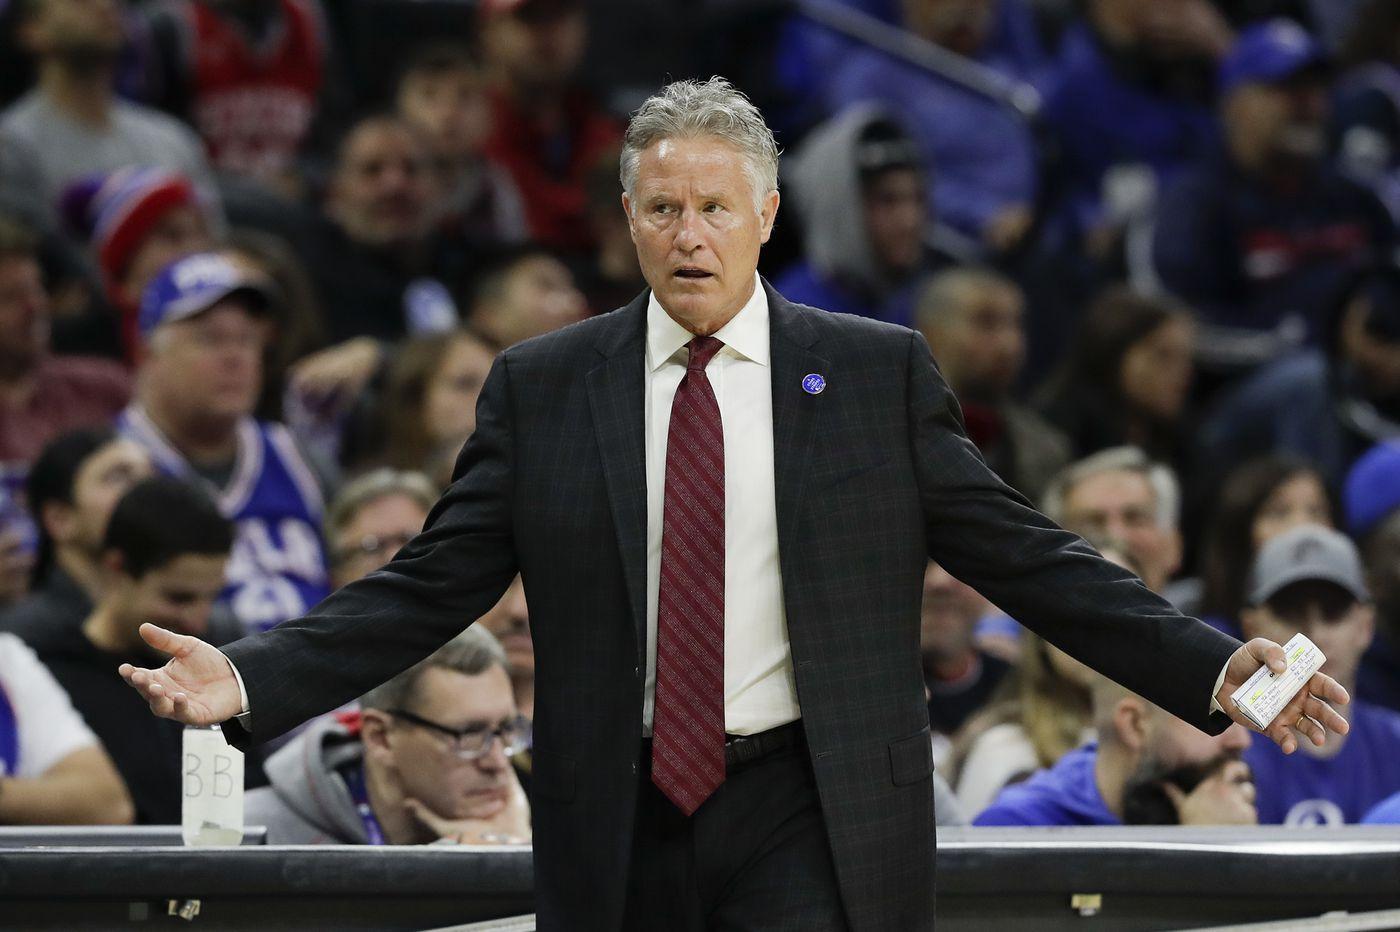 Sixers coach Brett Brown fears the San Antonio Spurs despite their struggles